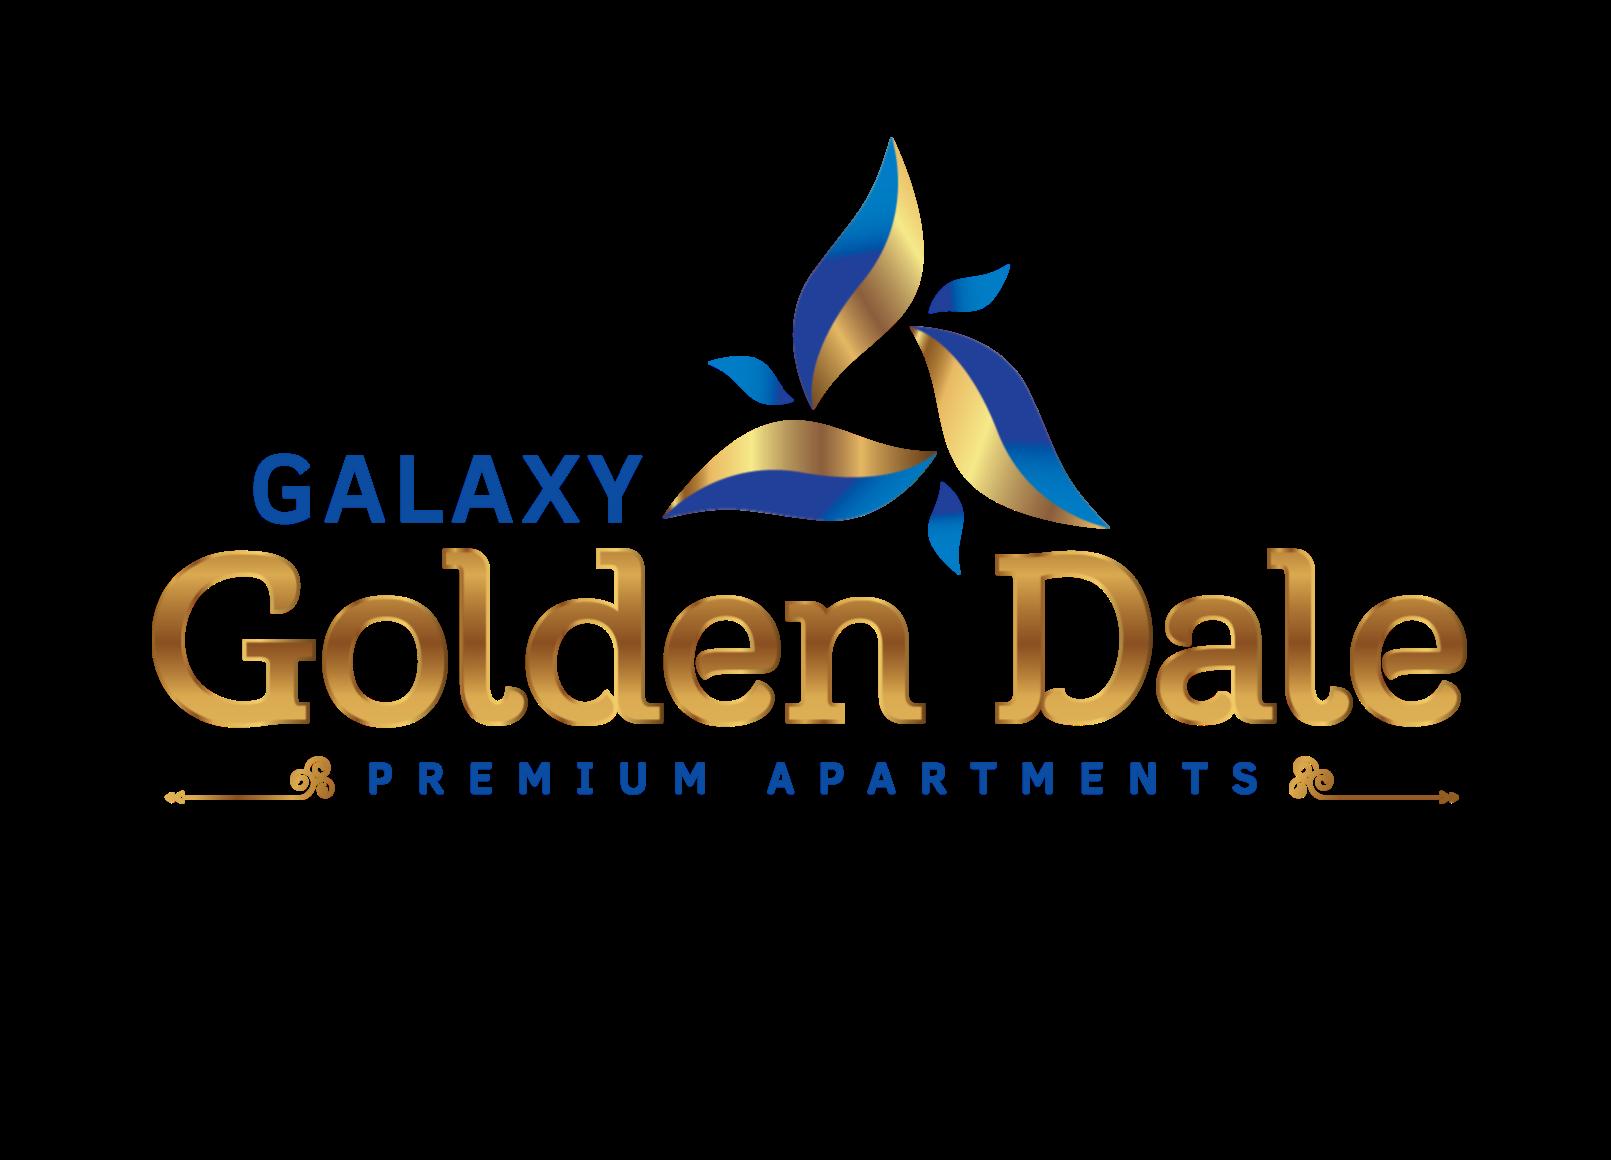 galaxy goldendale